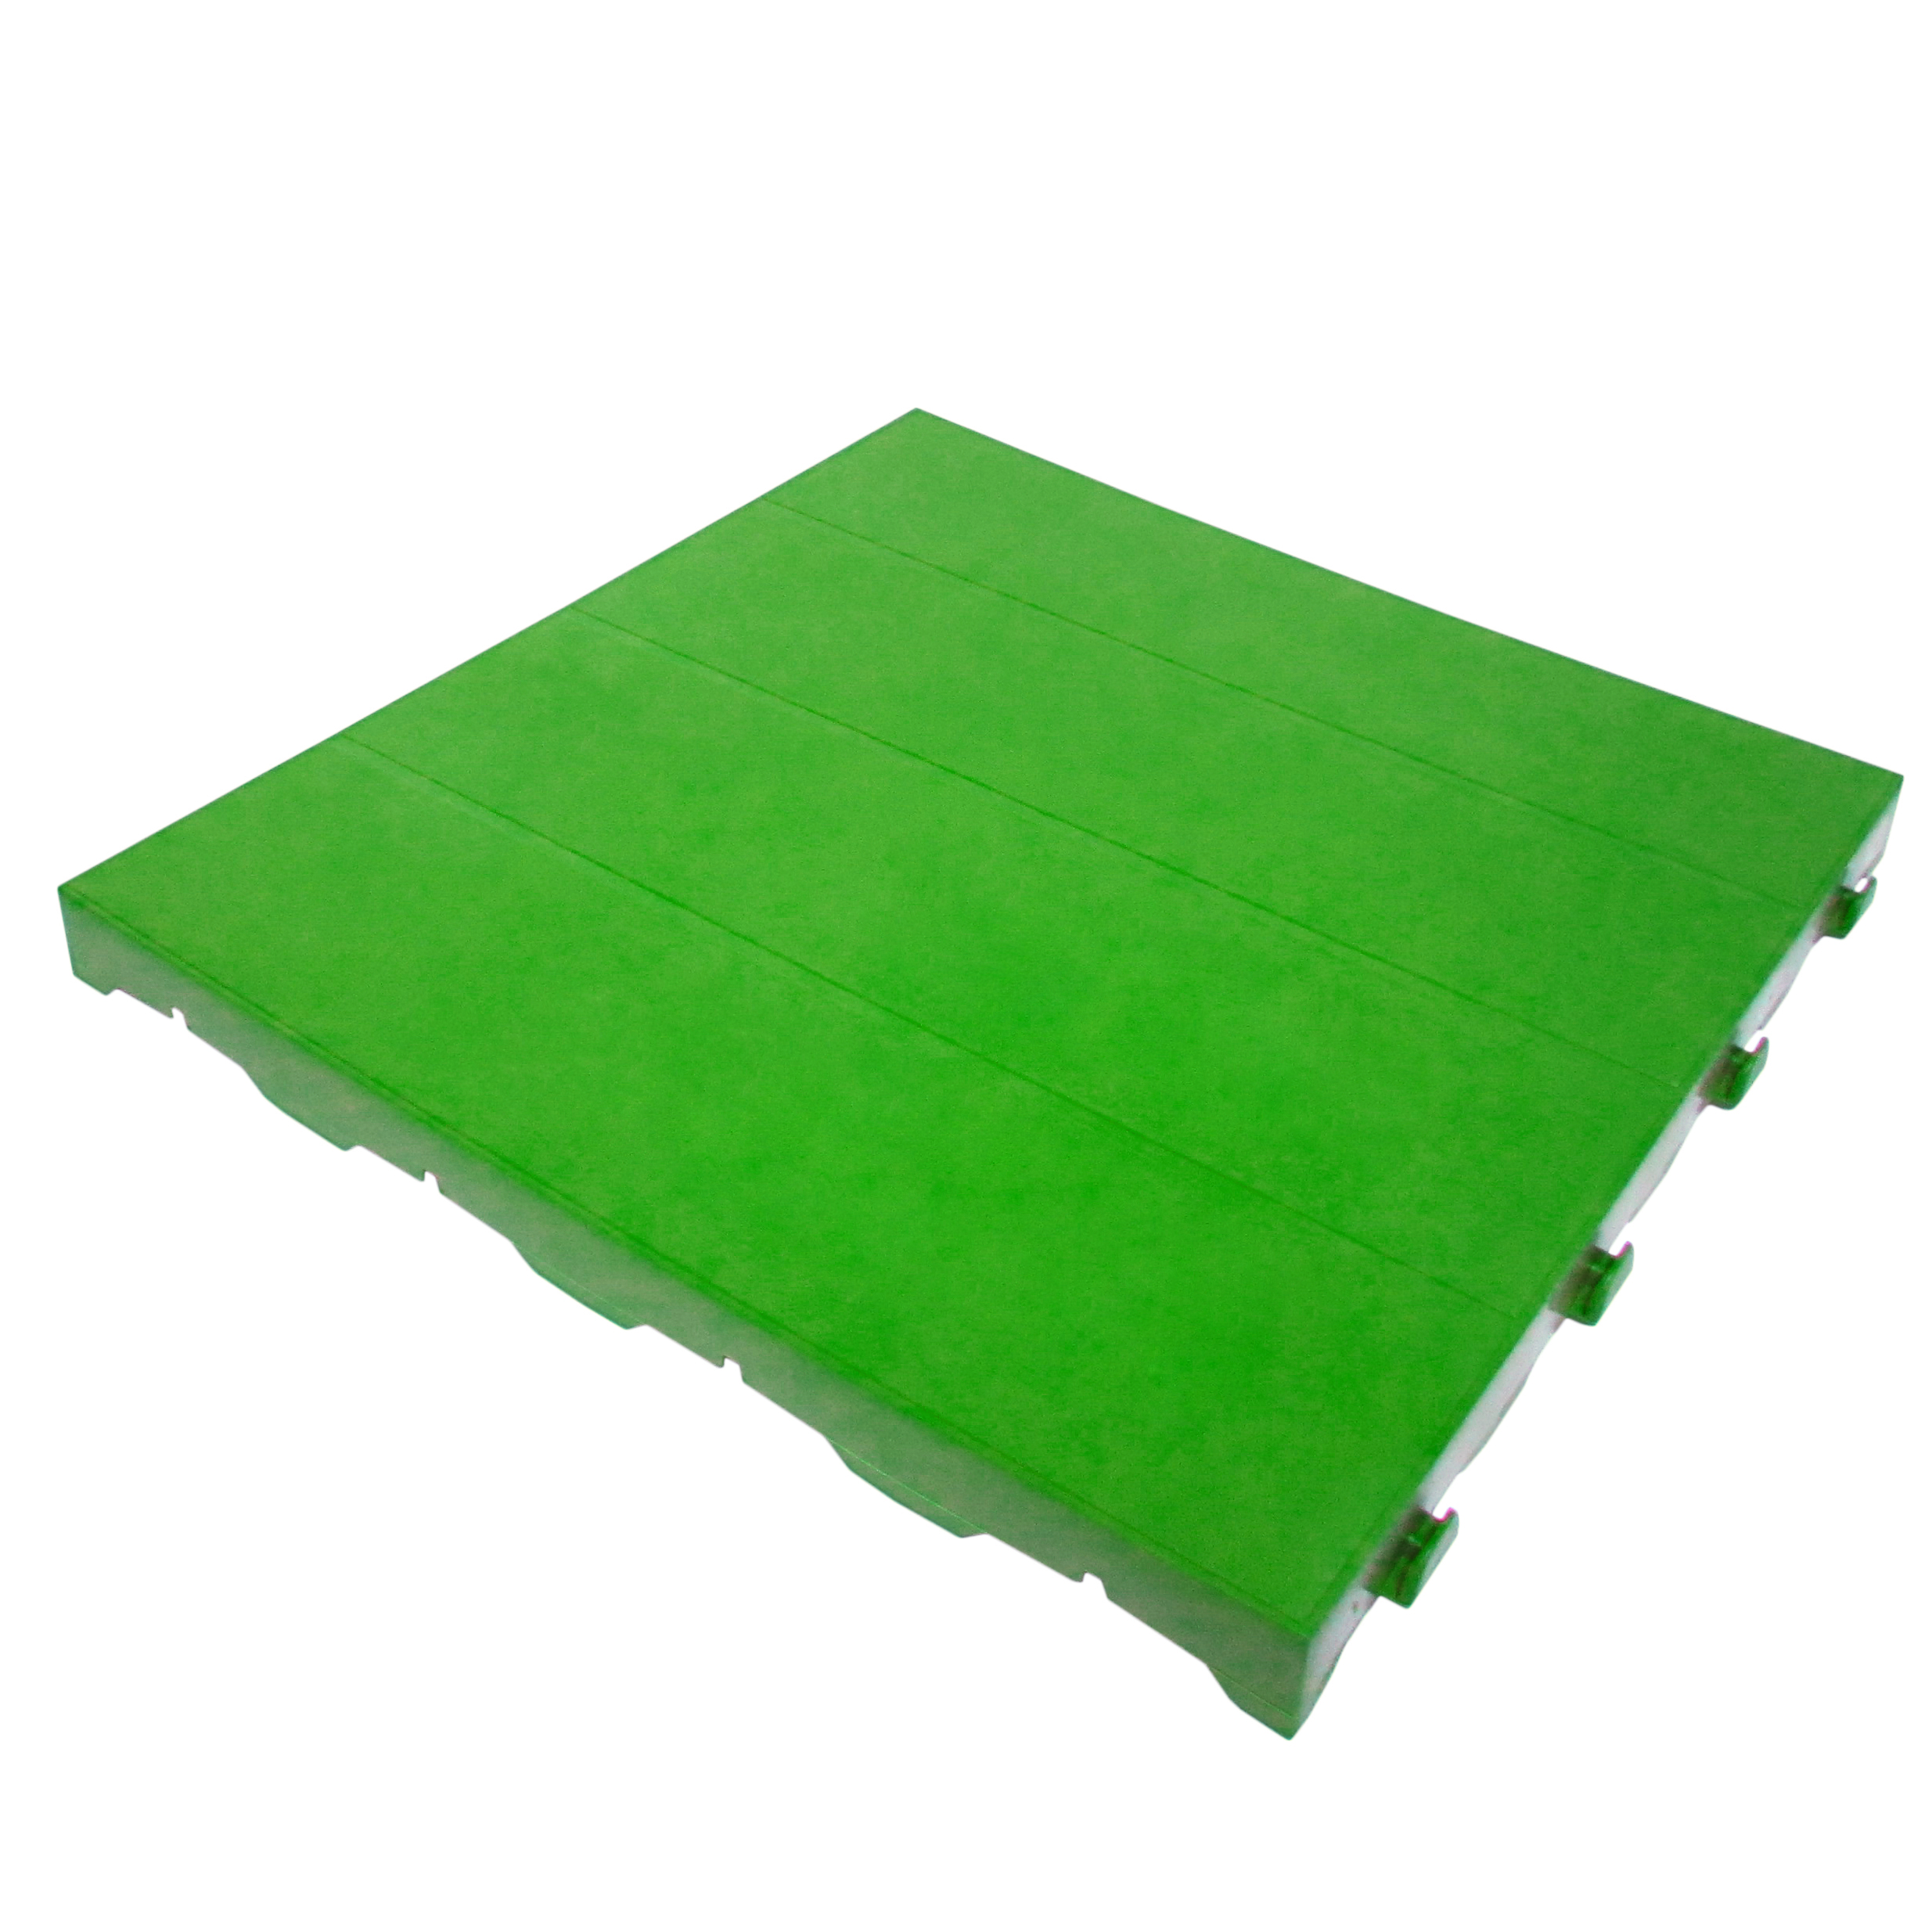 piastrelle da giardino offerte: pavimento in gomma per esterni: a ... - Offerte Piastrelle Da Esterno